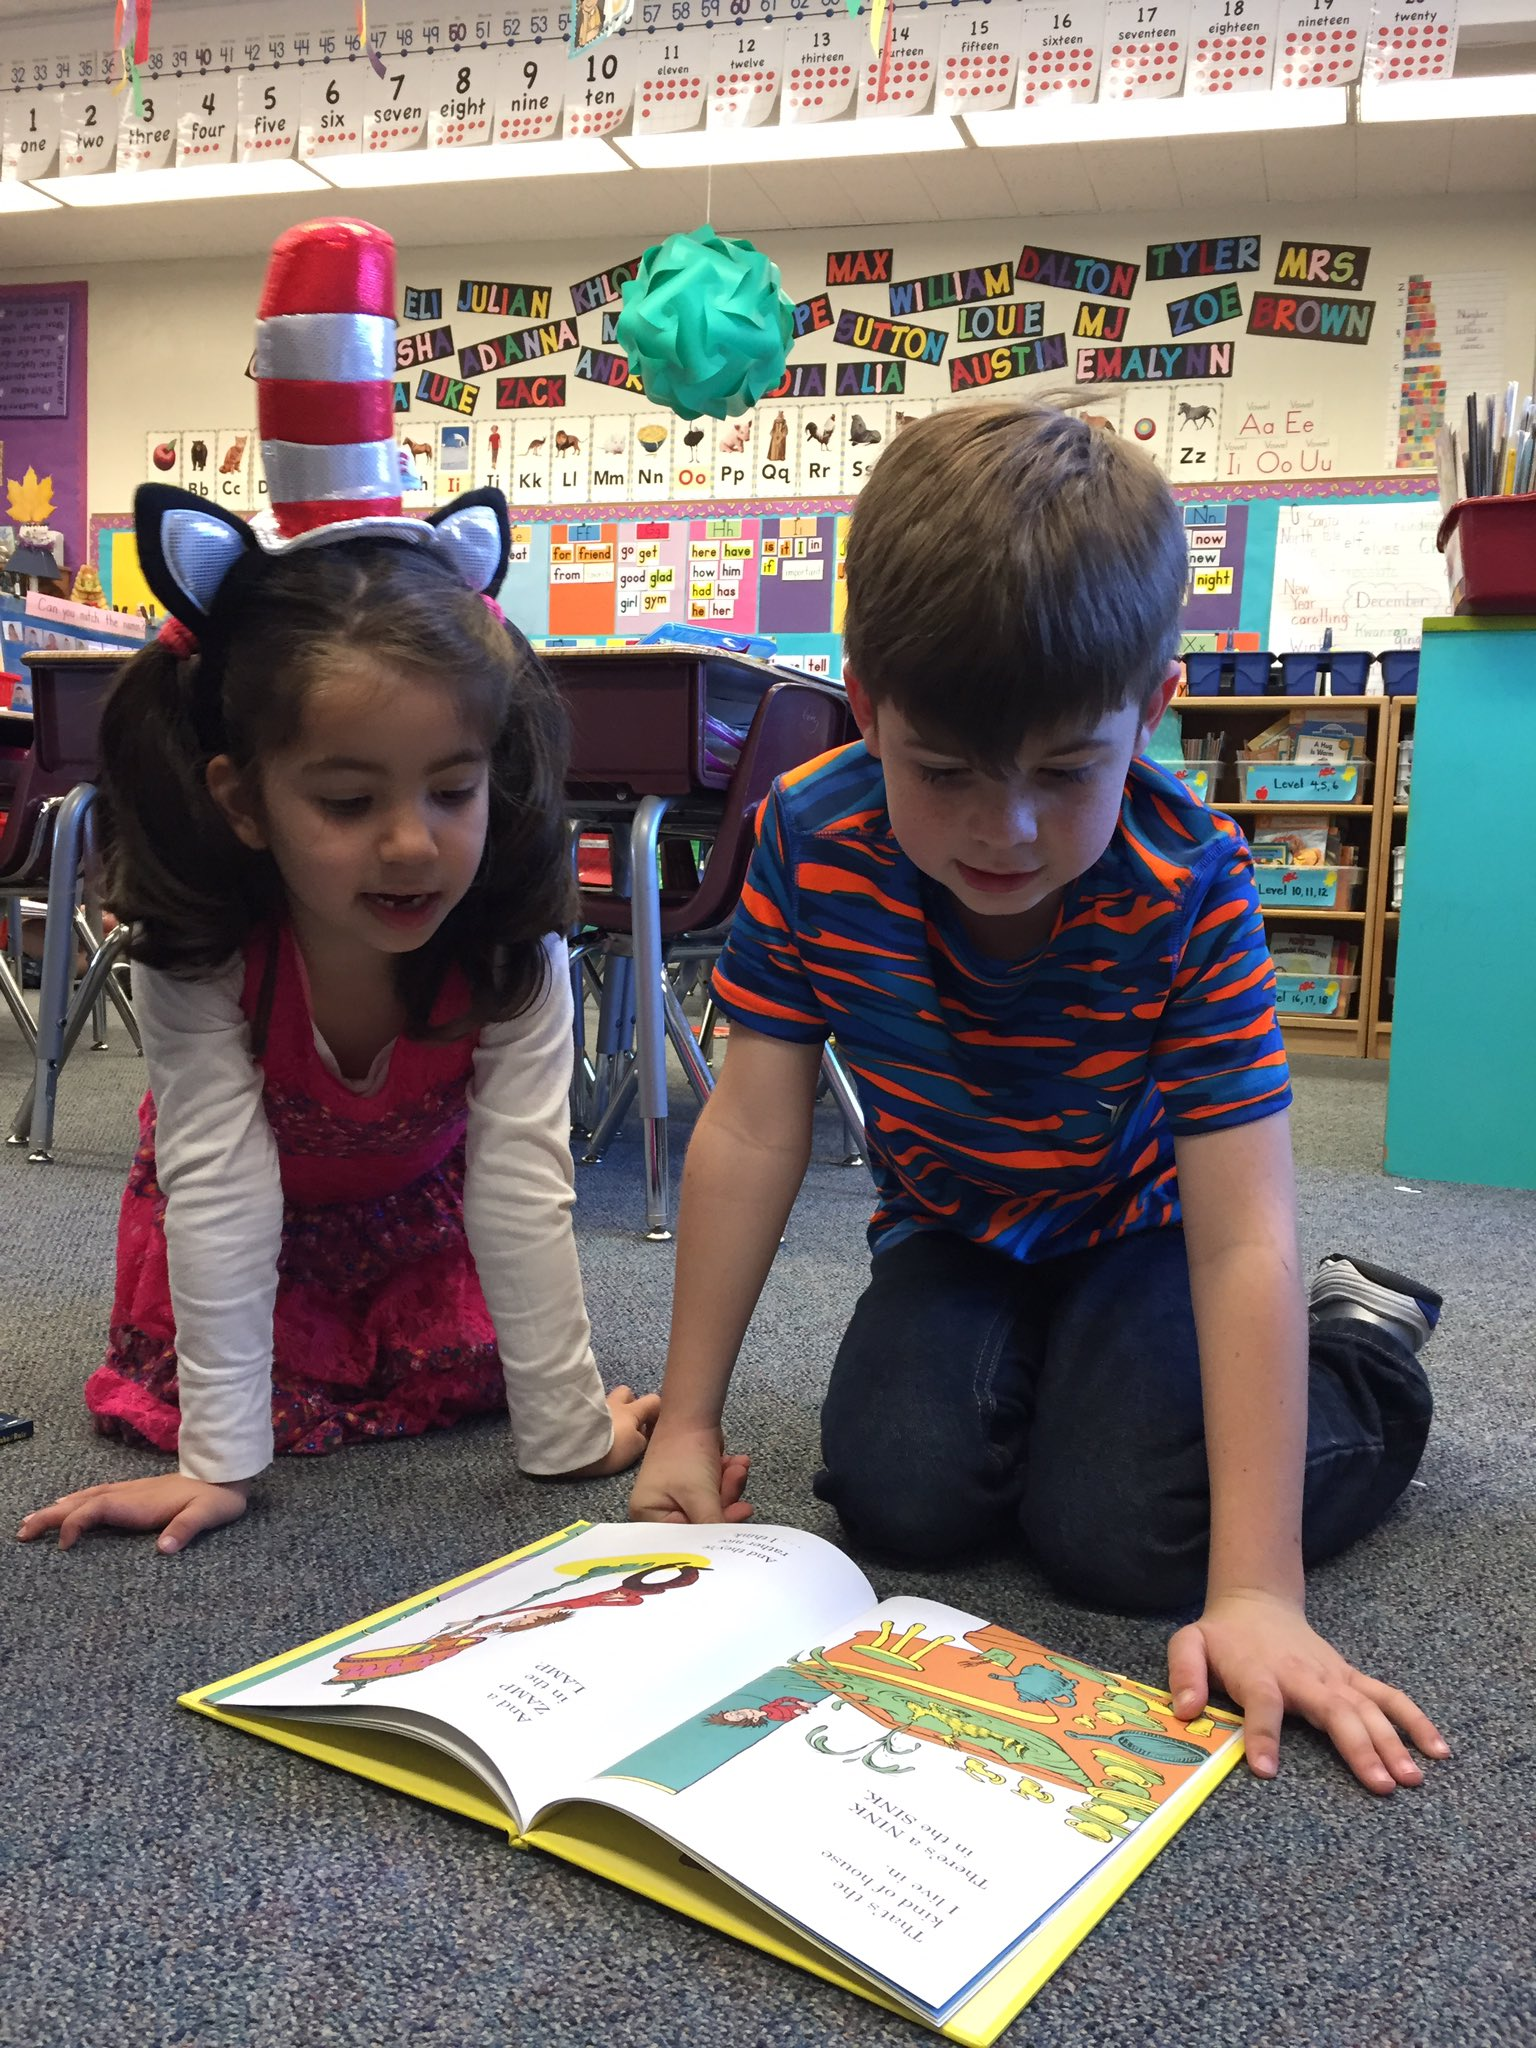 Happy #ReadAcrossAmerica day celebrating #DrSeuss with reading buddies in first grade @DUSD4kids @FredPrincipal https://t.co/DKwr5a6dau